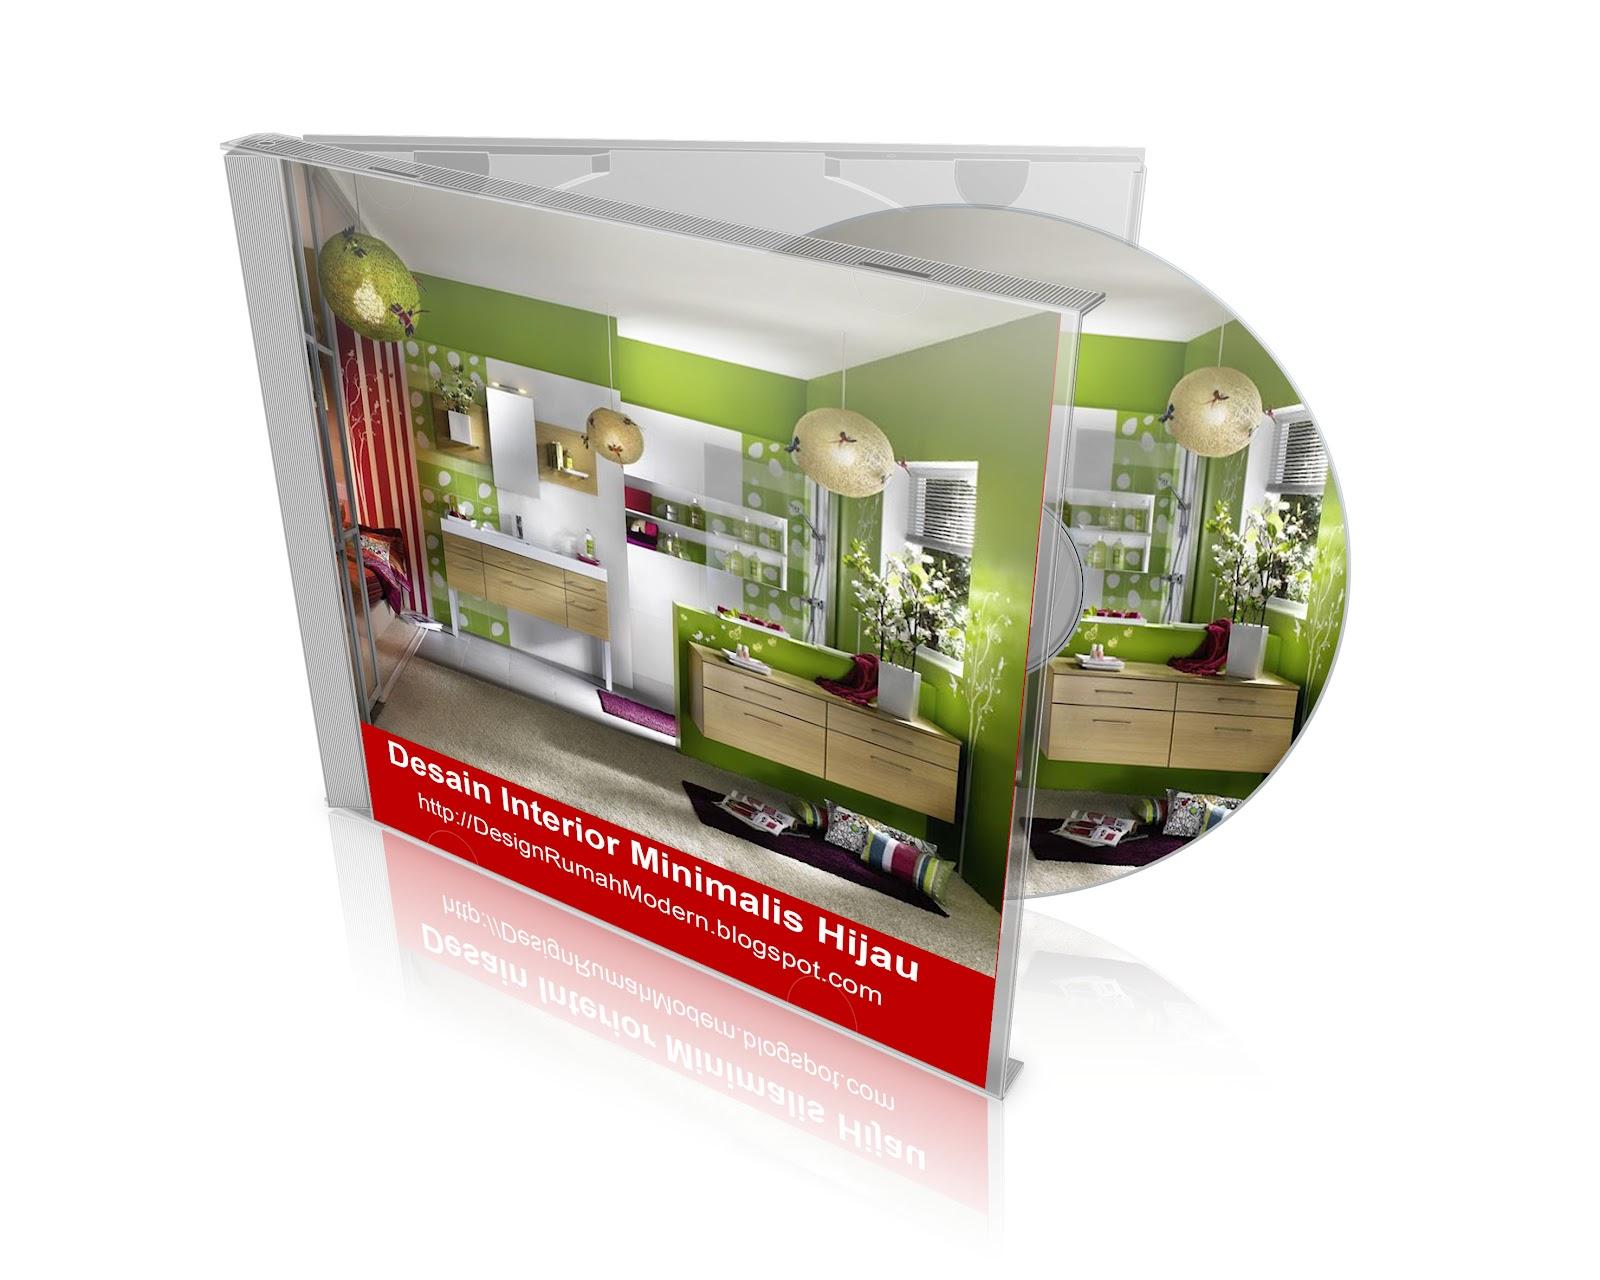 design rumah modern minimalis 2015 desain interior hijau